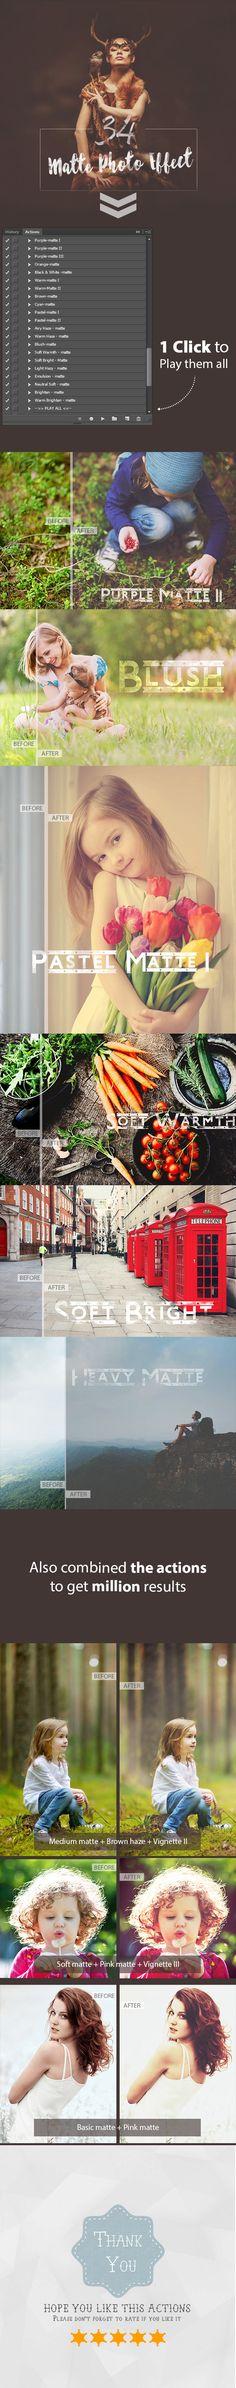 34 Matte Photo Effect Premium Collection #photoeffect #photoshop Download: http://graphicriver.net/item/34-matte-photo-effect-premium-collection/13571705?ref=ksioks